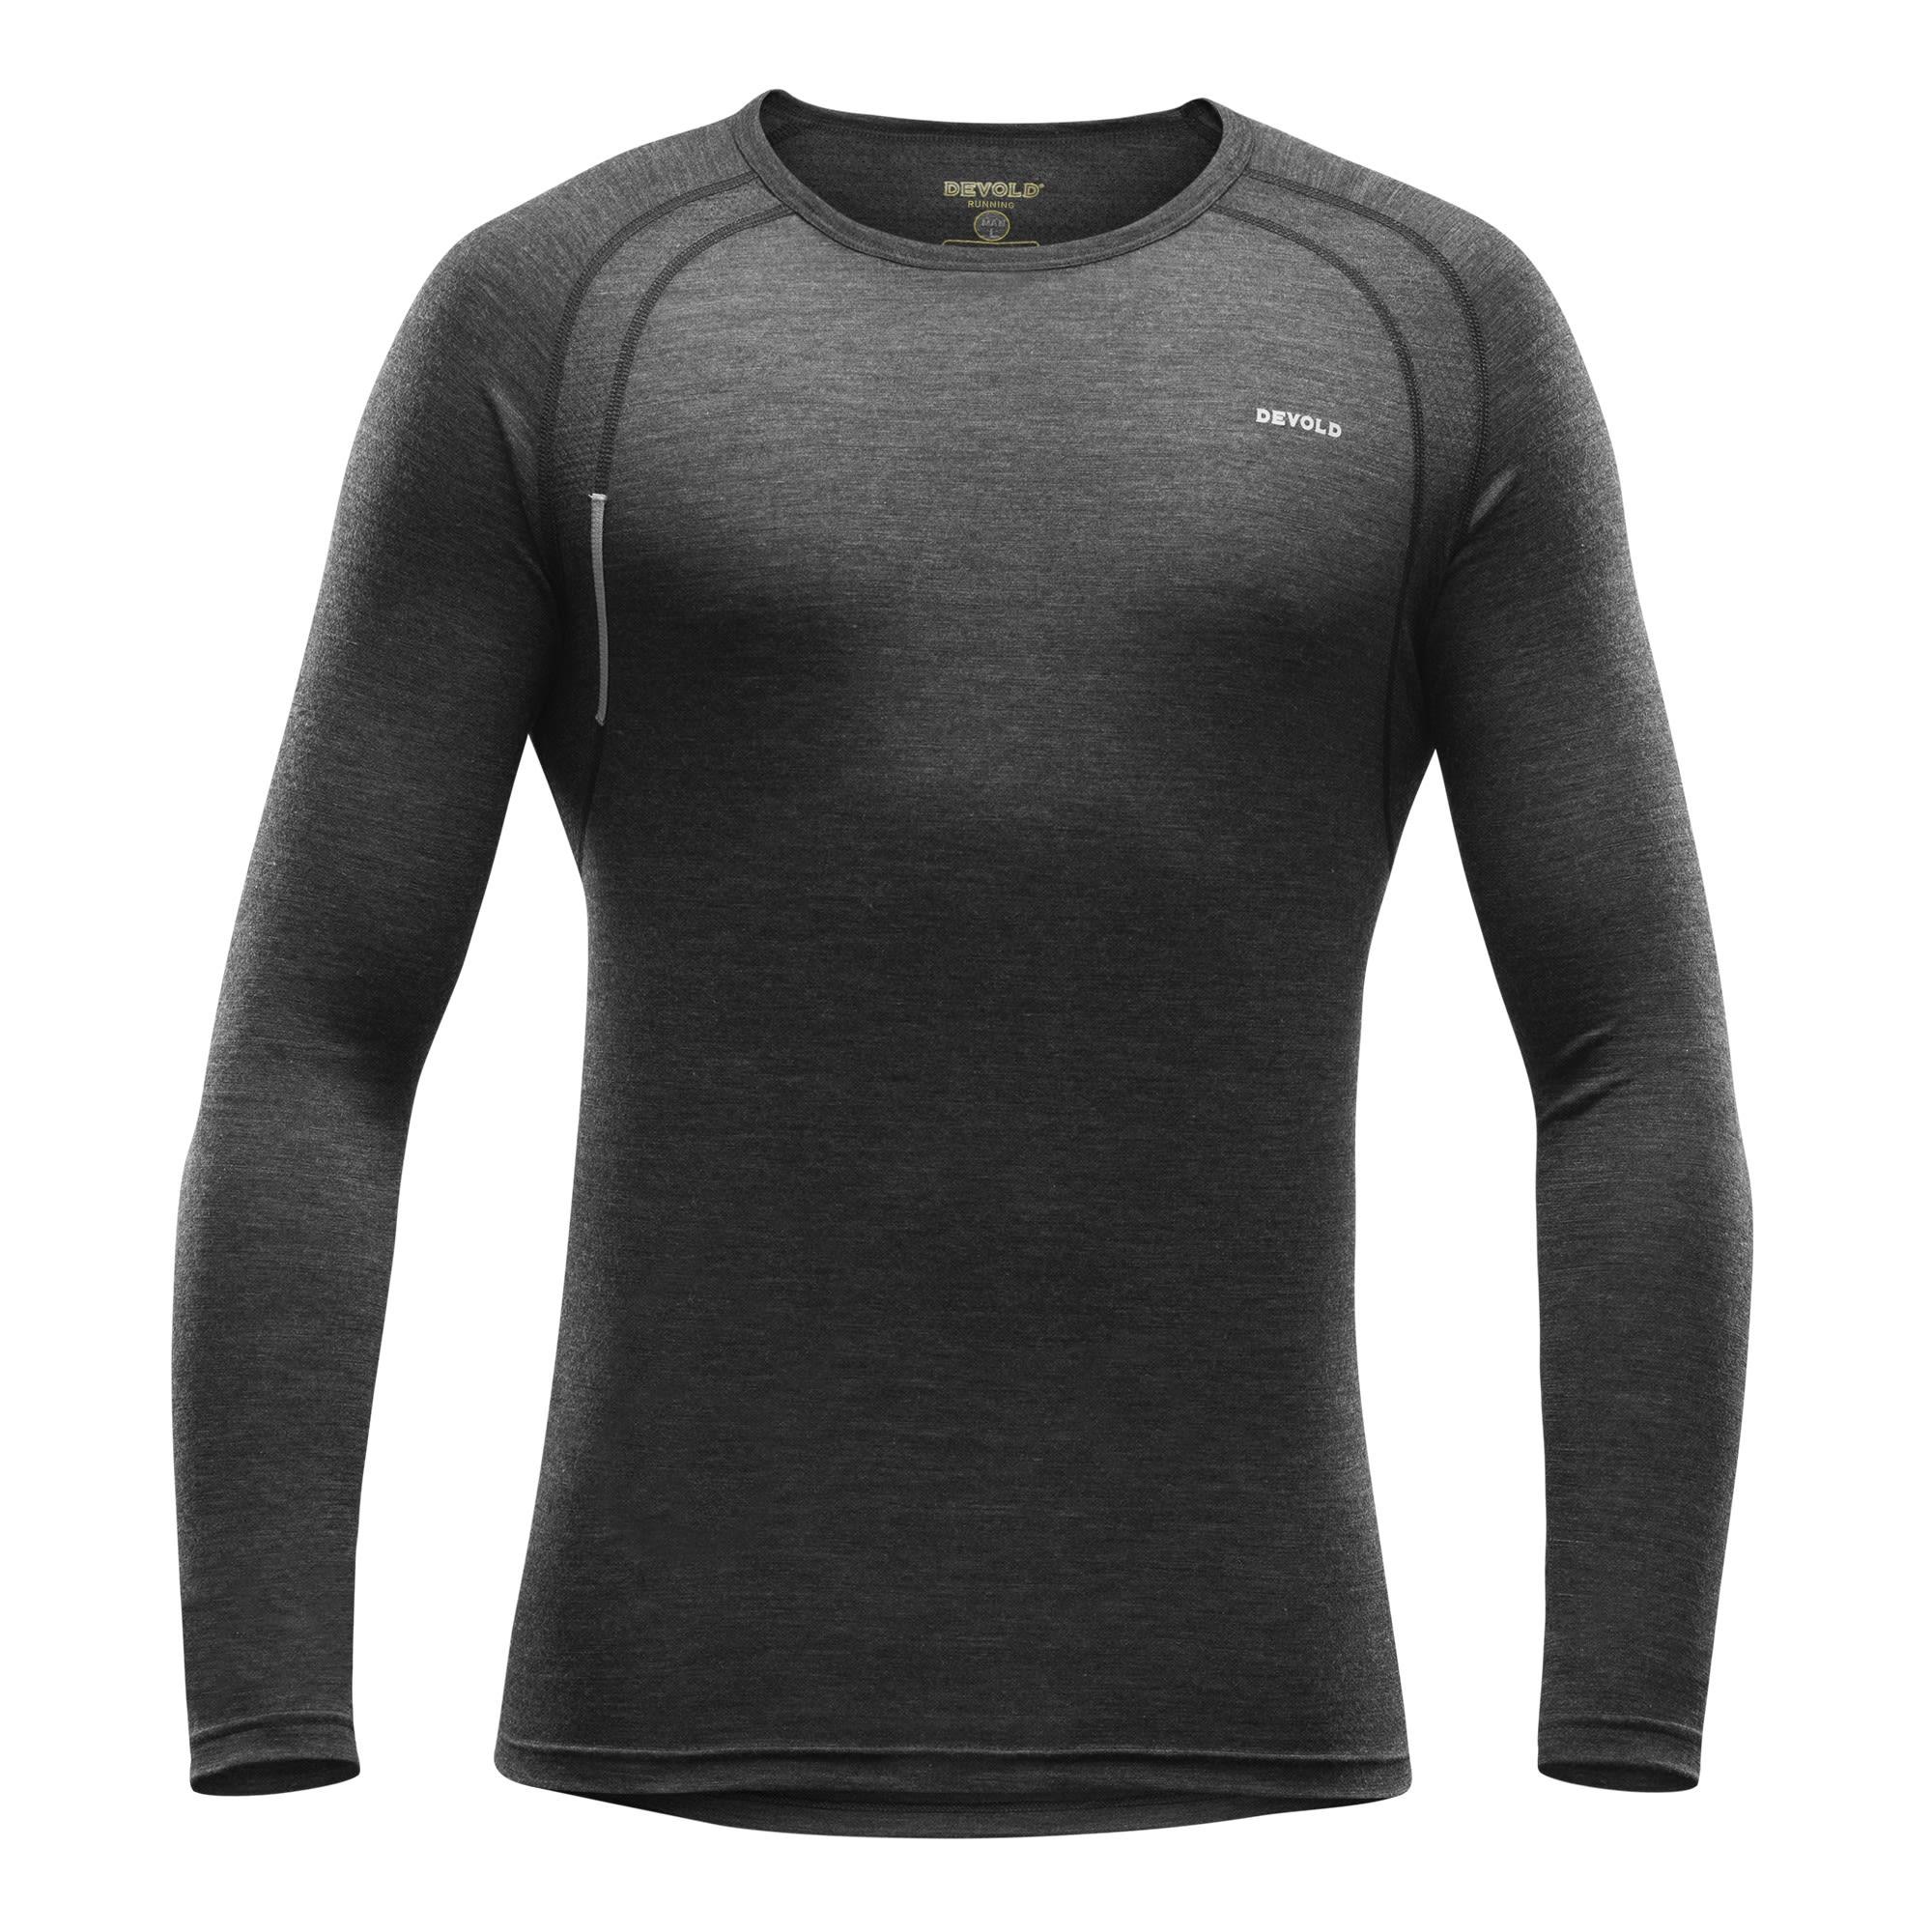 Devold Running MAN Shirt (Modell Winter 2017) Grau, Male Merino XL -Farbe Anthra